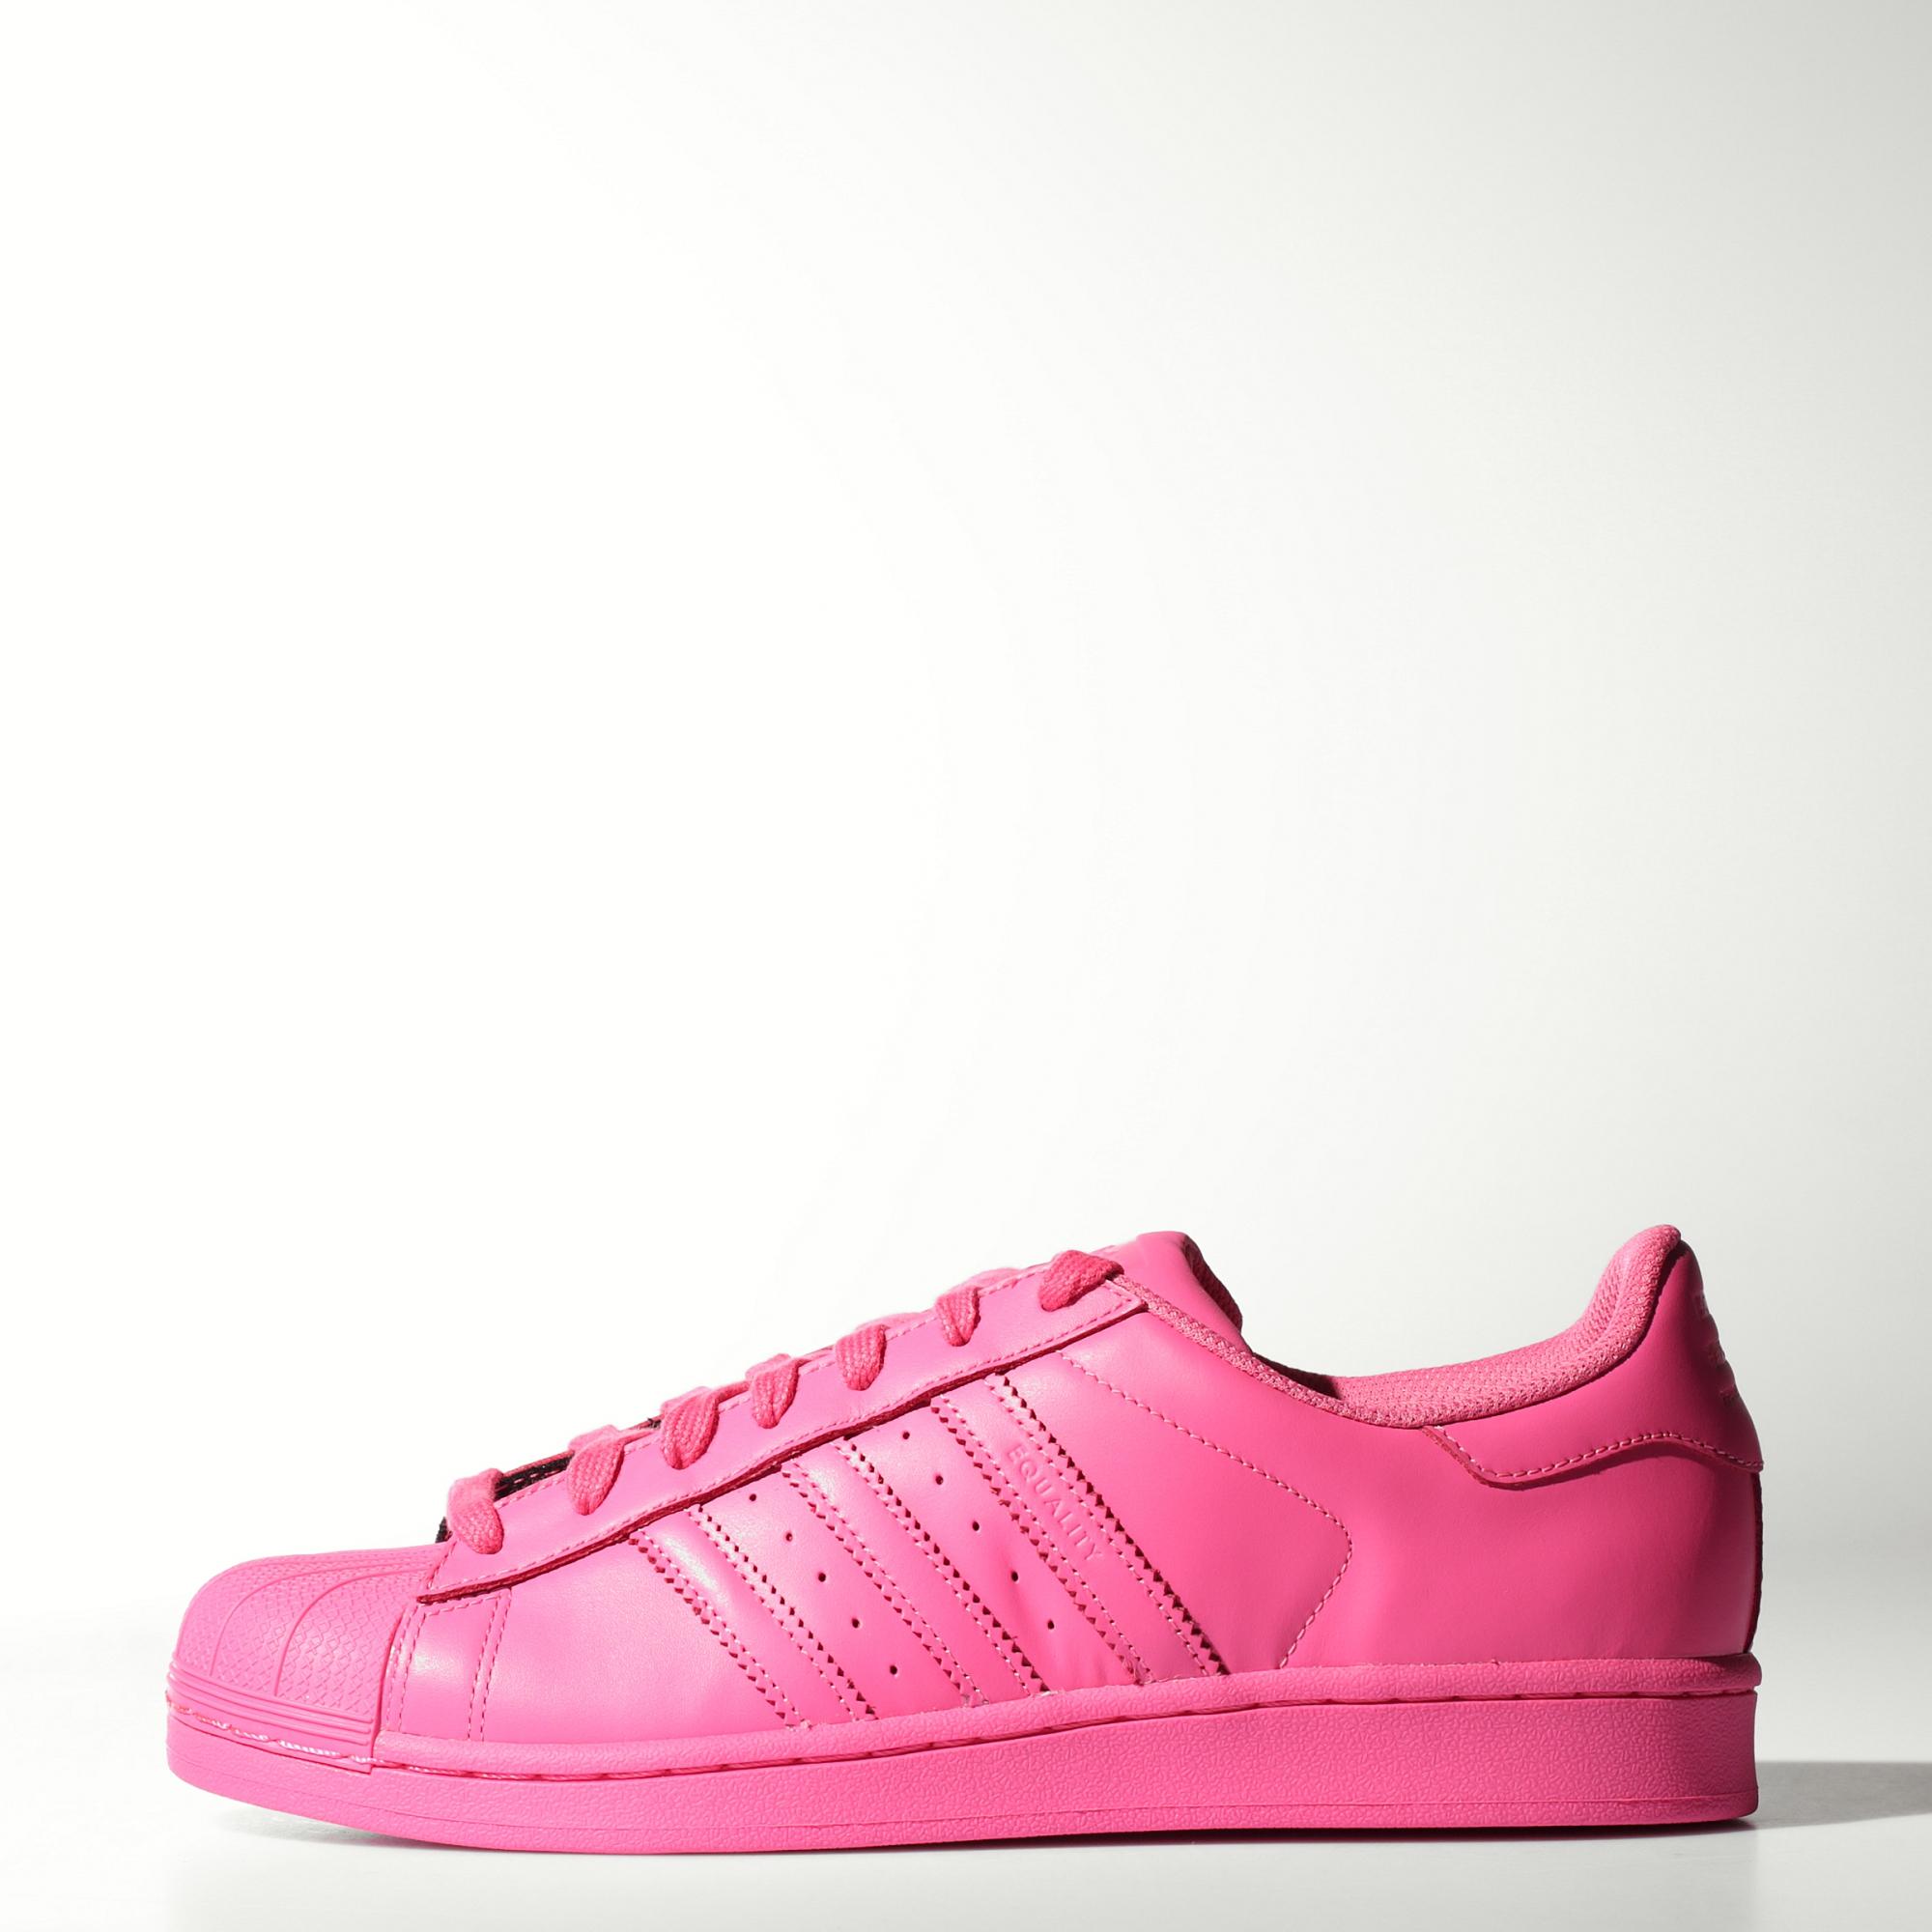 Adidas Superstar Rosas Enteras